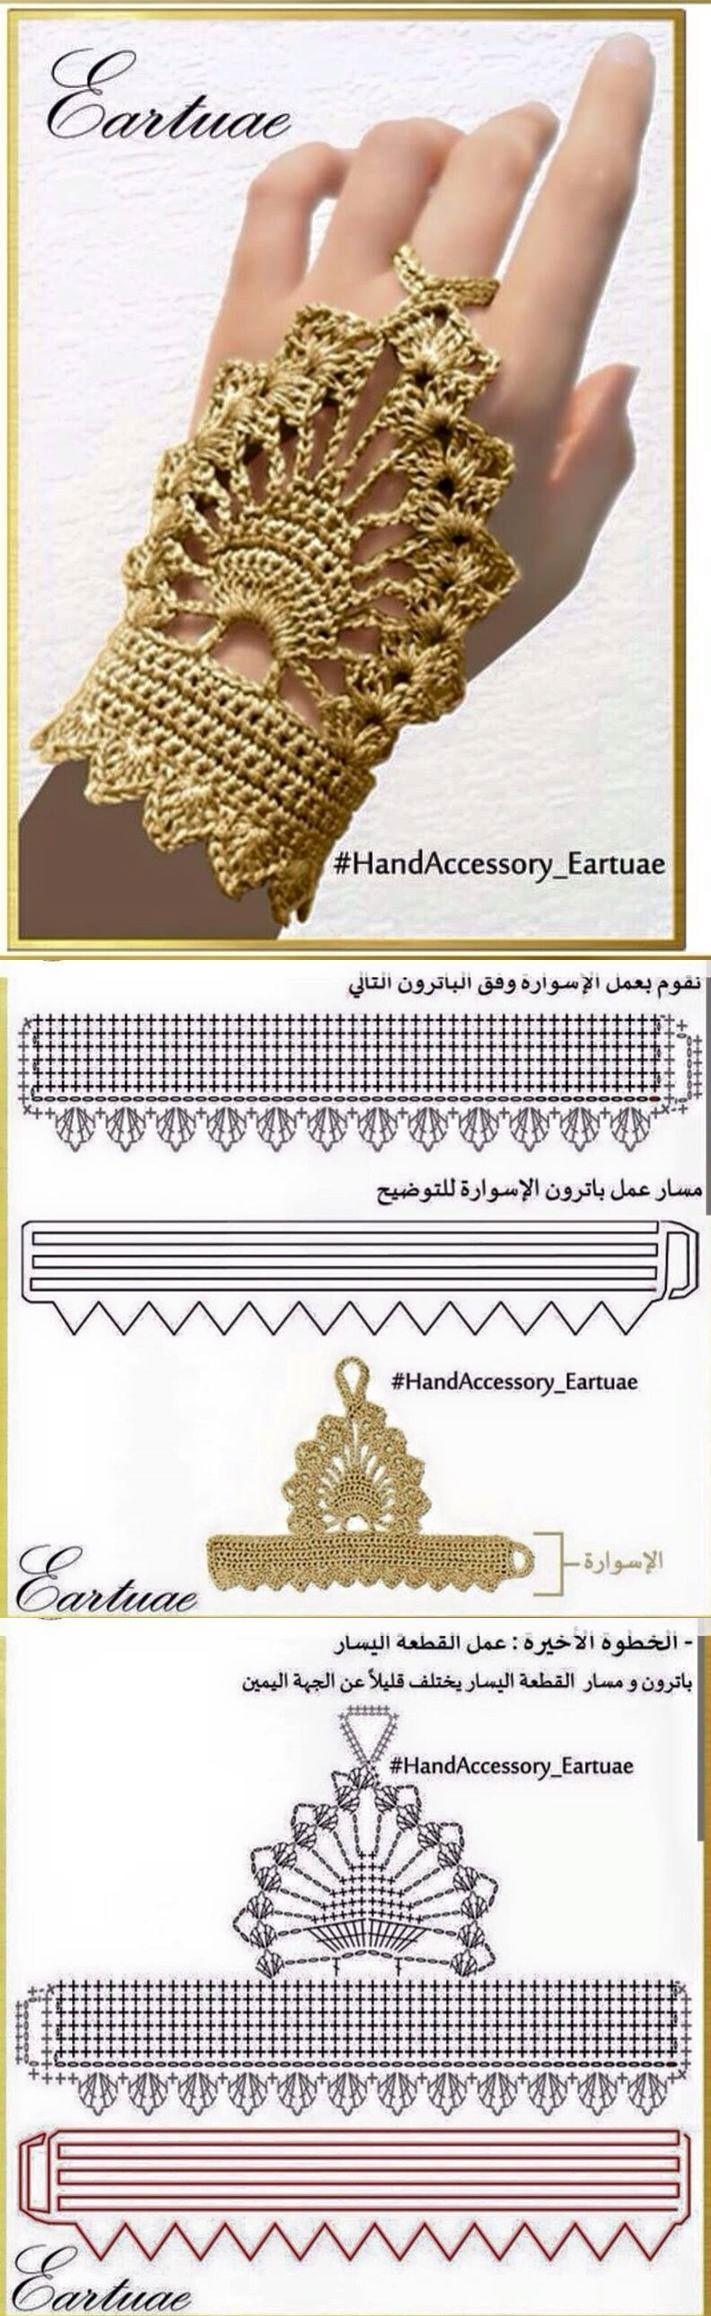 Crochet Hand Accessory - Chart ❥ 4U hilariafina http://www.pinterest.com/hilariafina/: